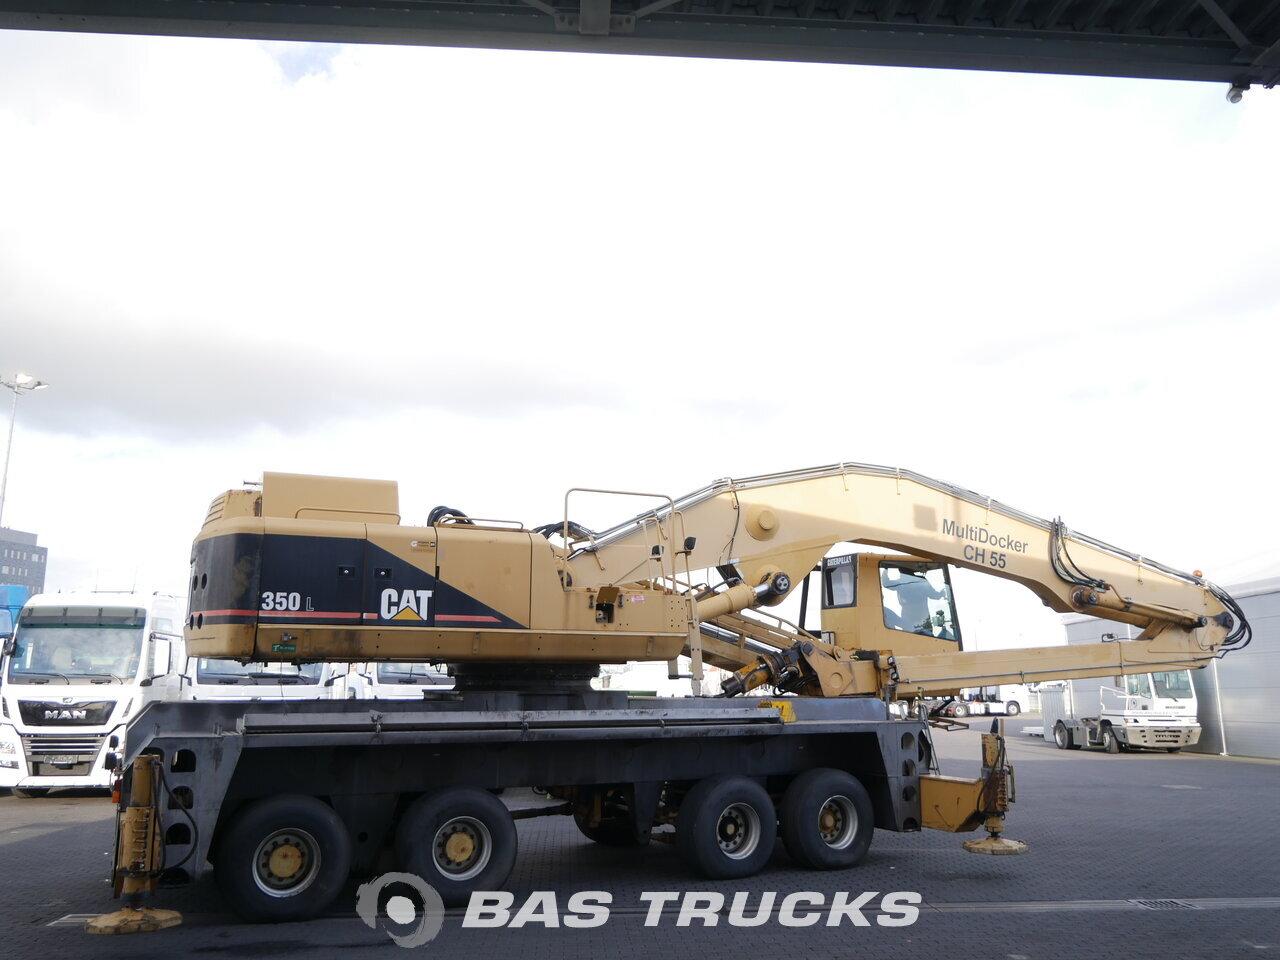 Fénykép: Used Građevinski strojevi Caterpillar Multidocker CH55 8X4 1998